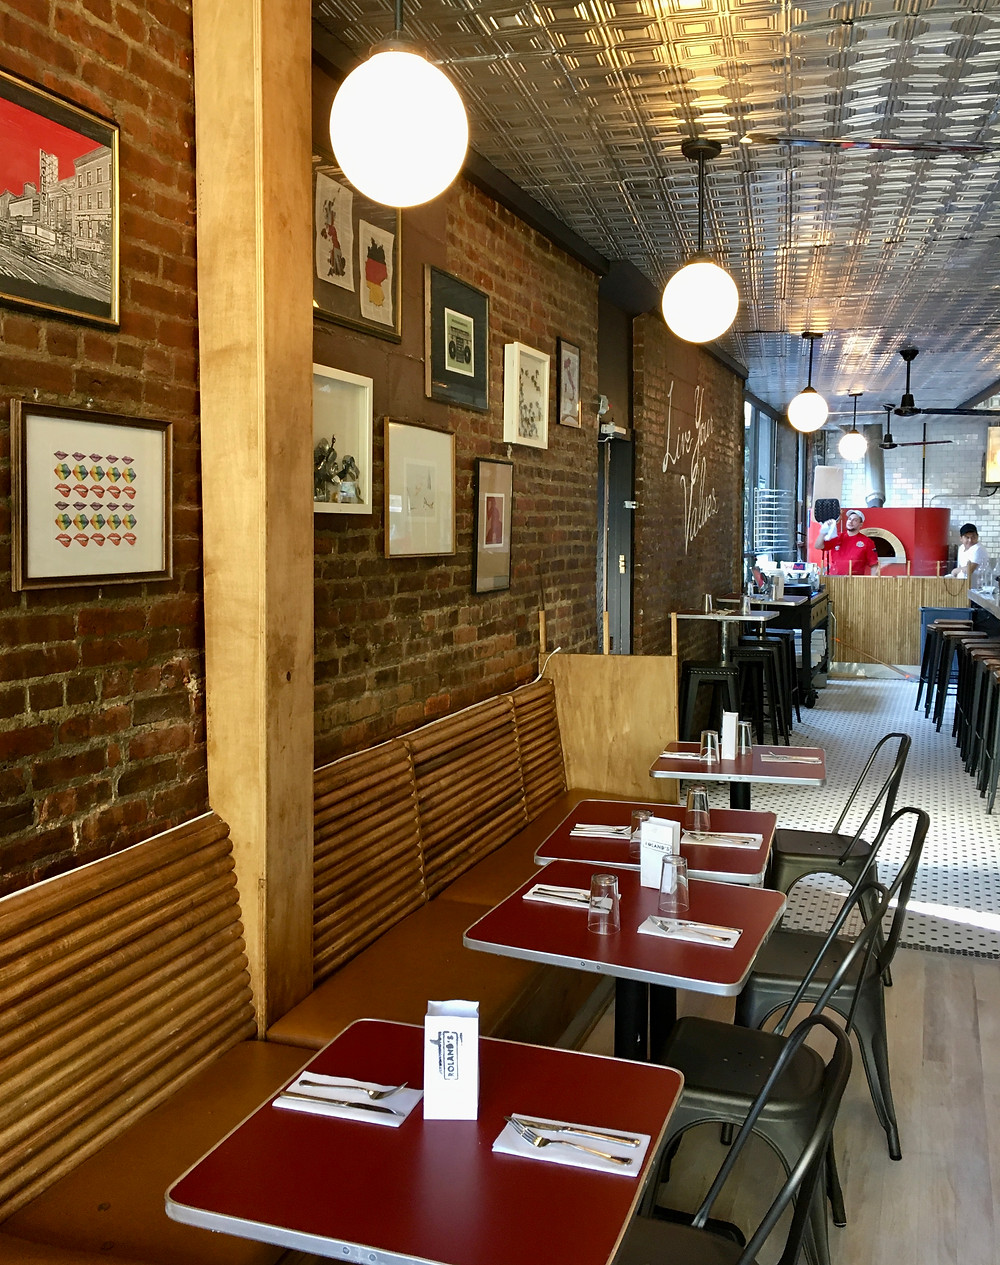 Roland's, a new Harlem spot for crisp Roman-style pizza